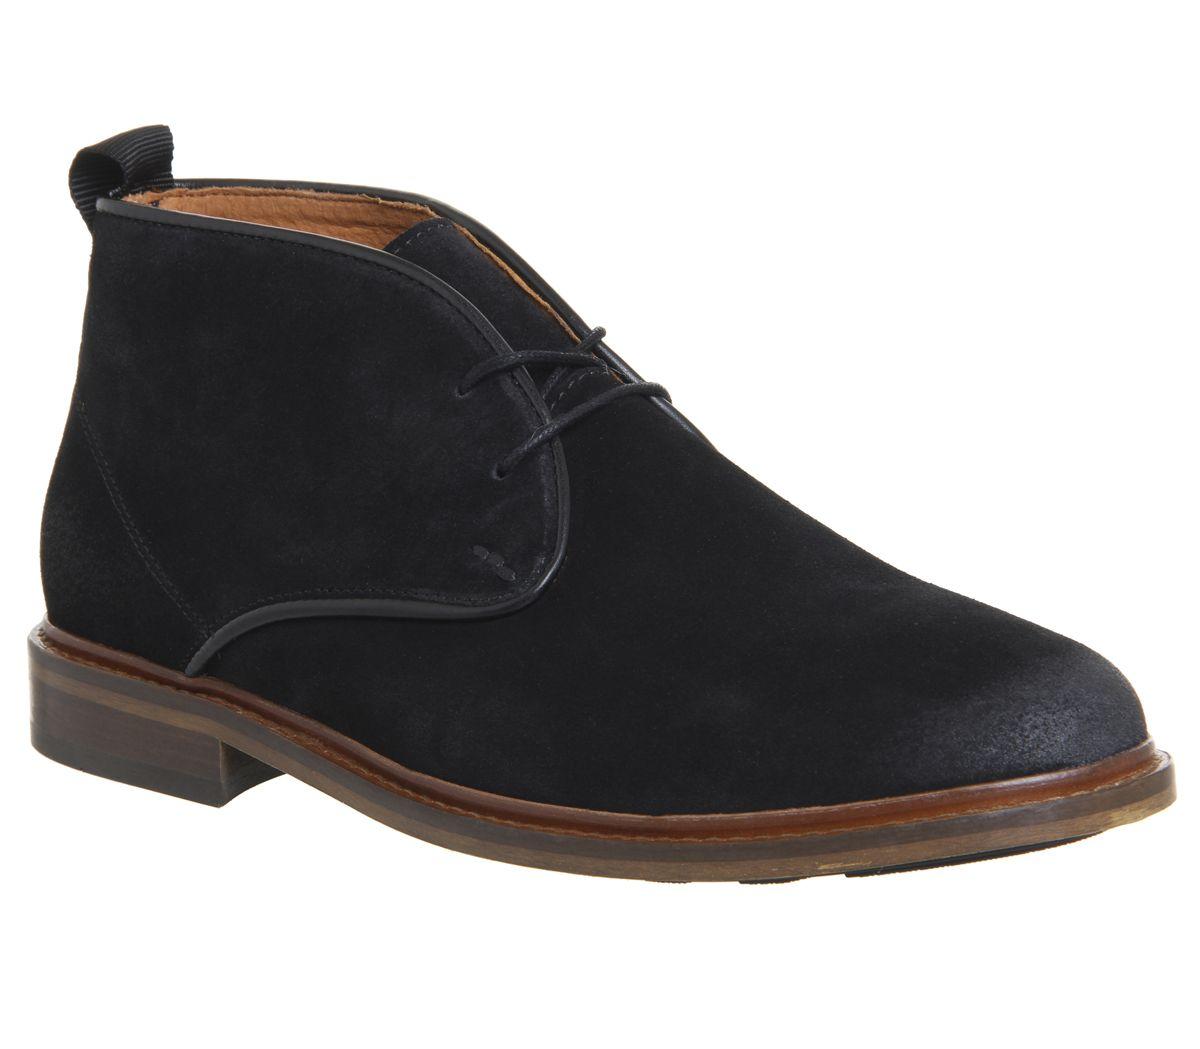 fb1ad1ab99f Dalton Chukka Boots